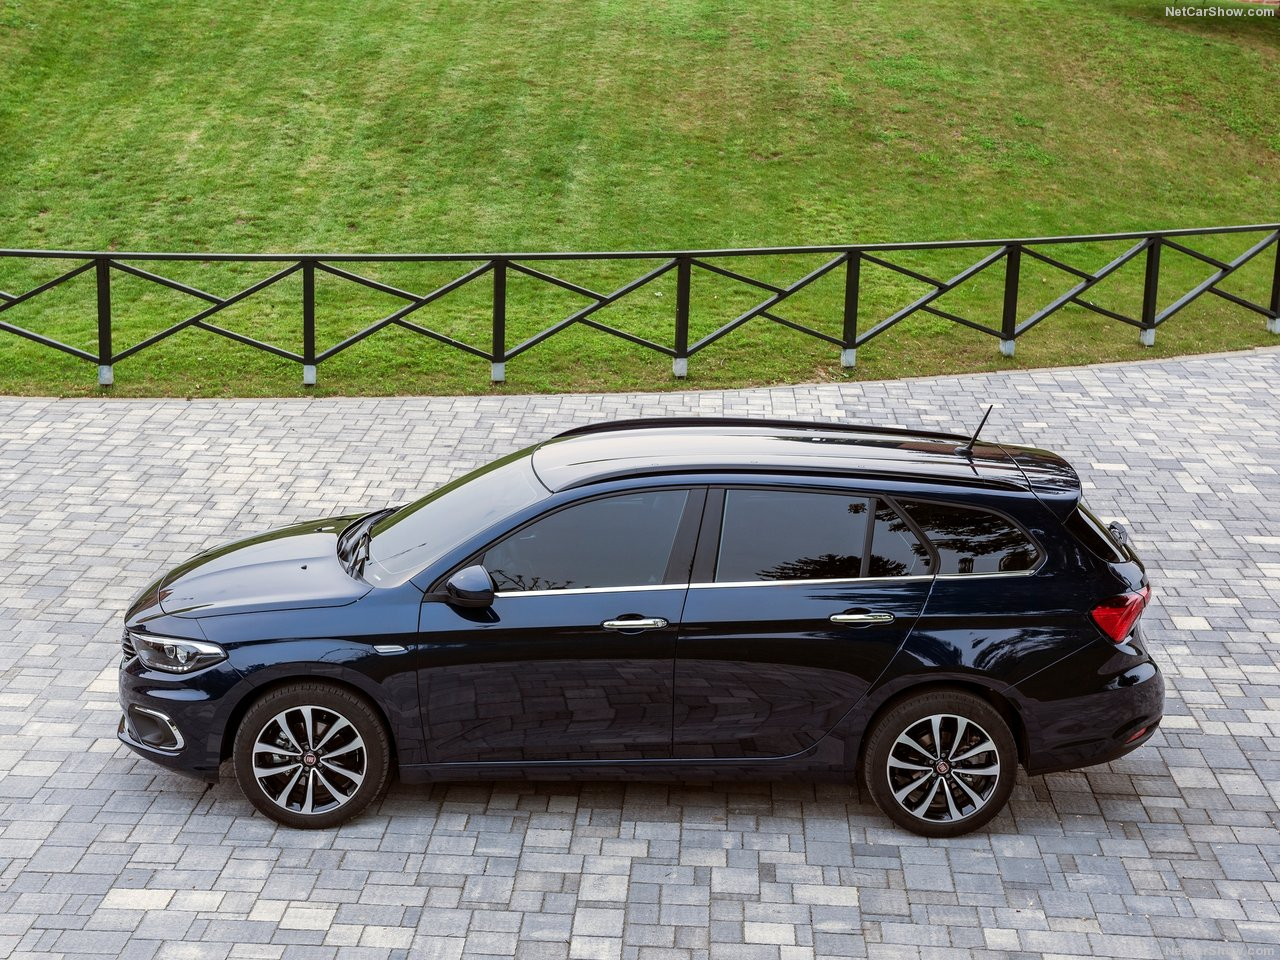 Fiat-Tipo_Station_Wagon-2017-1280-05